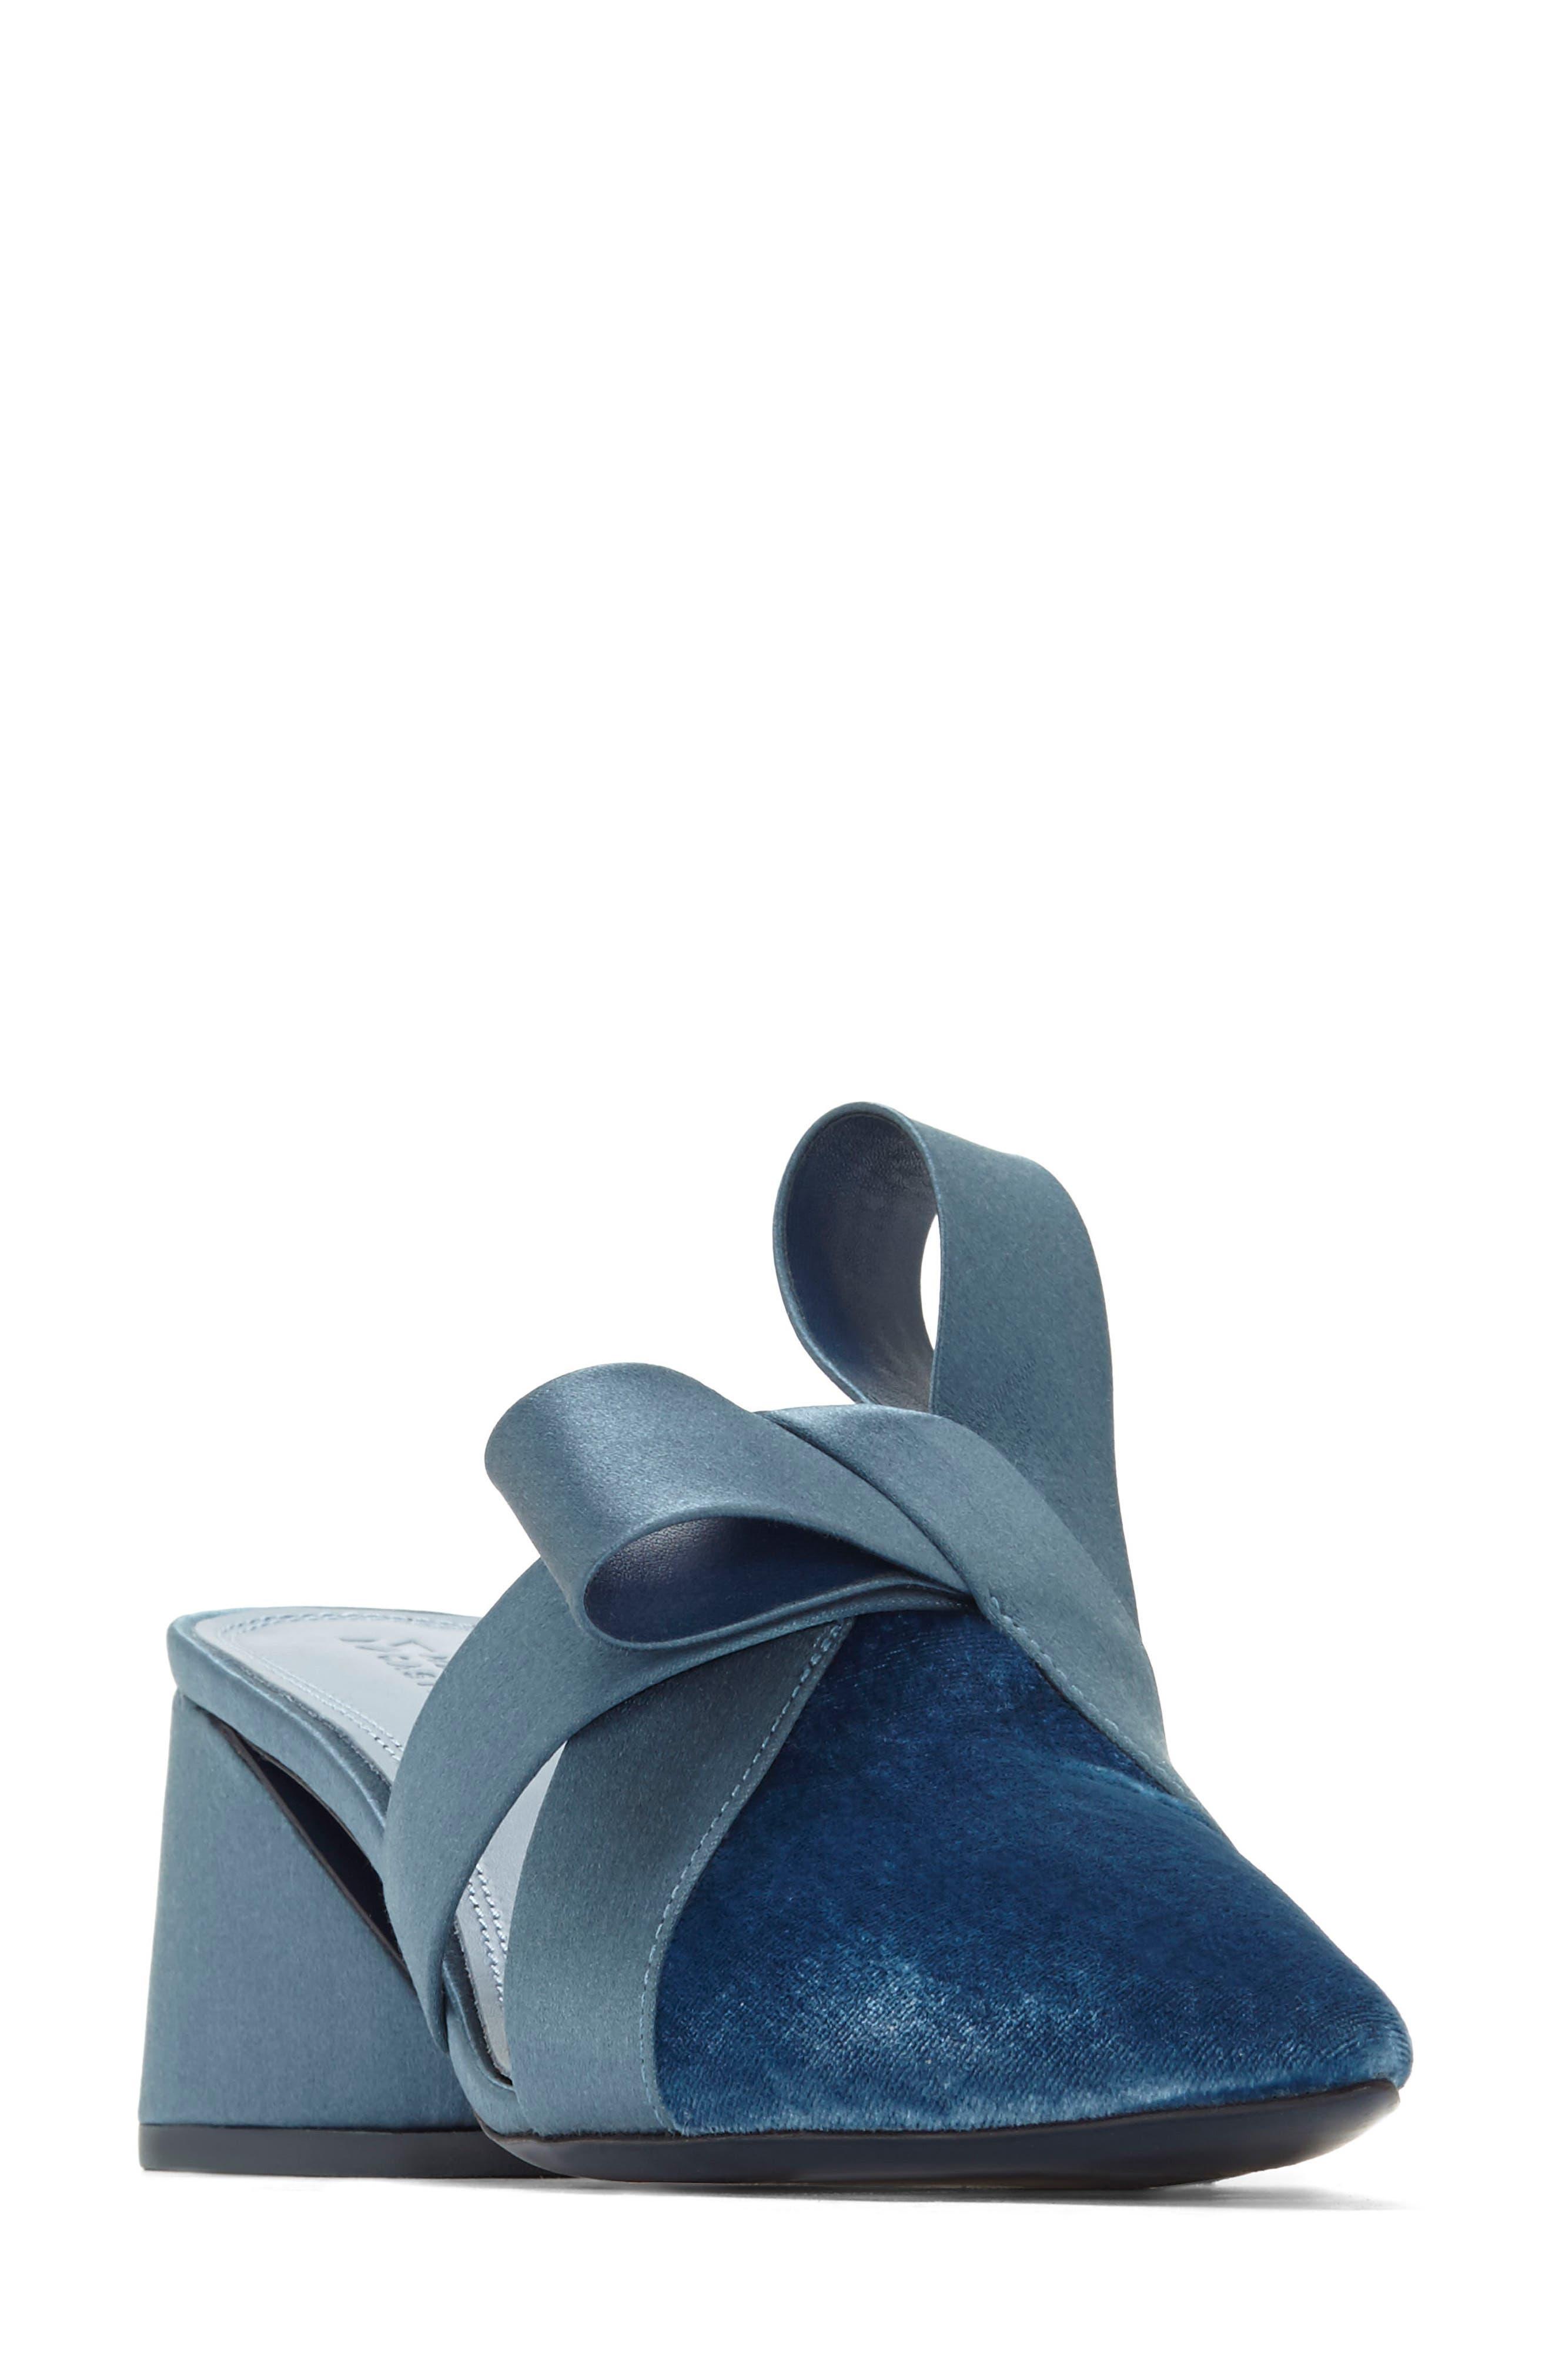 Blanche Mule,                         Main,                         color, Steel